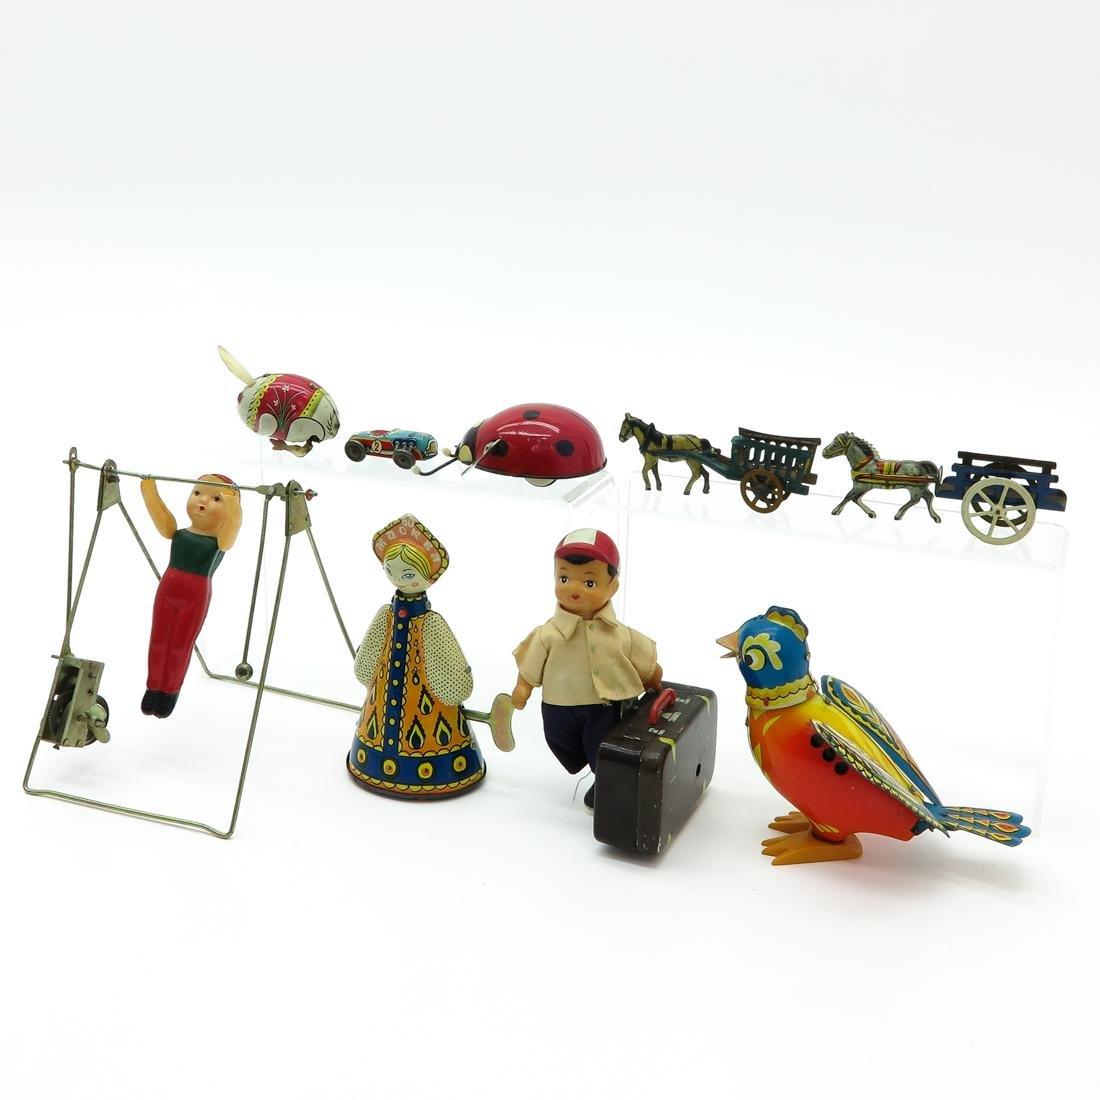 Lot of 9 Vintage Toys - 3